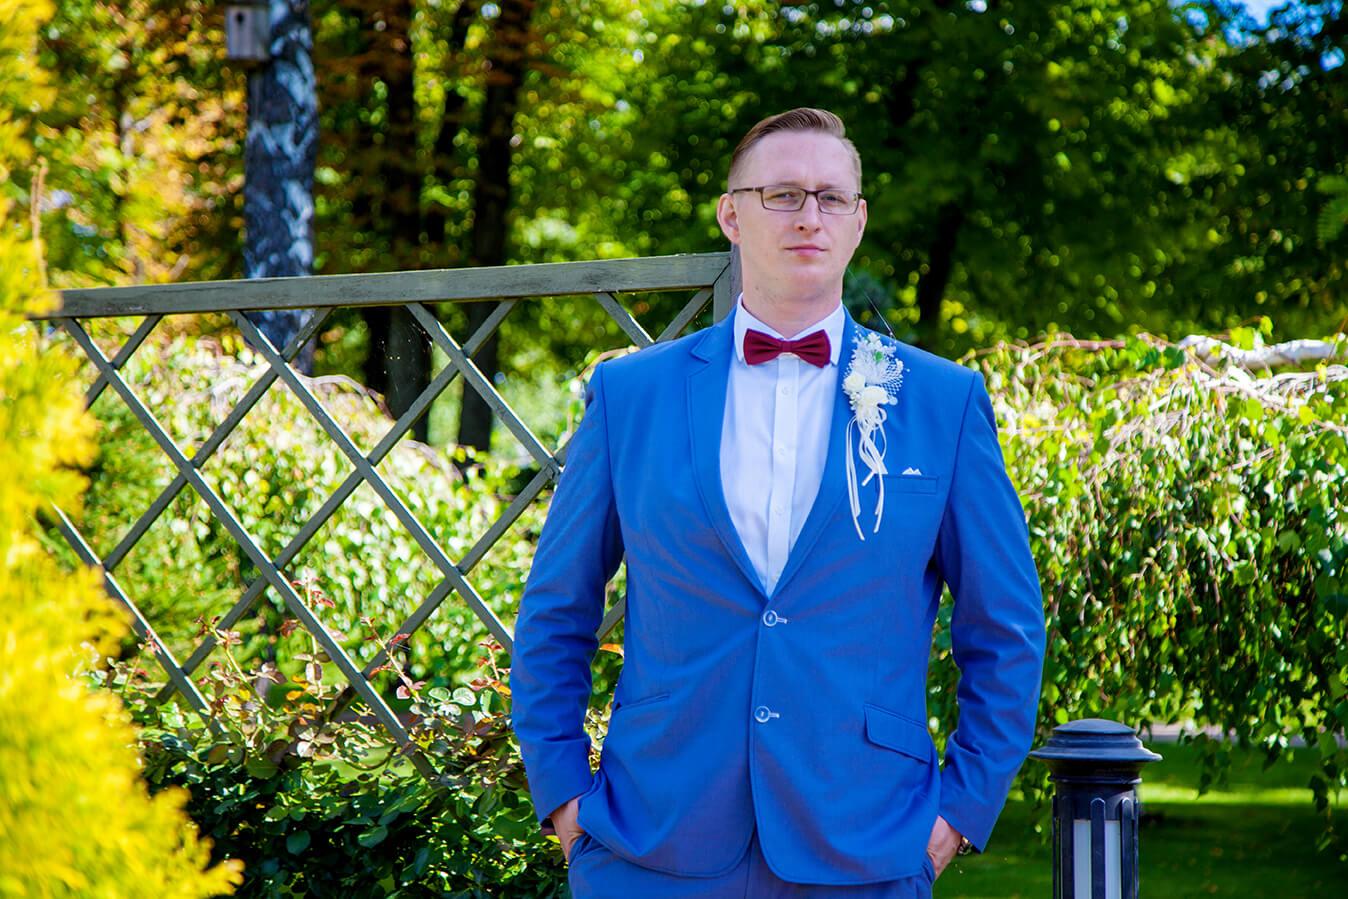 3-svadebnyj-fotograf-videooperator-svadebnoe-foto-idei-kiev-14